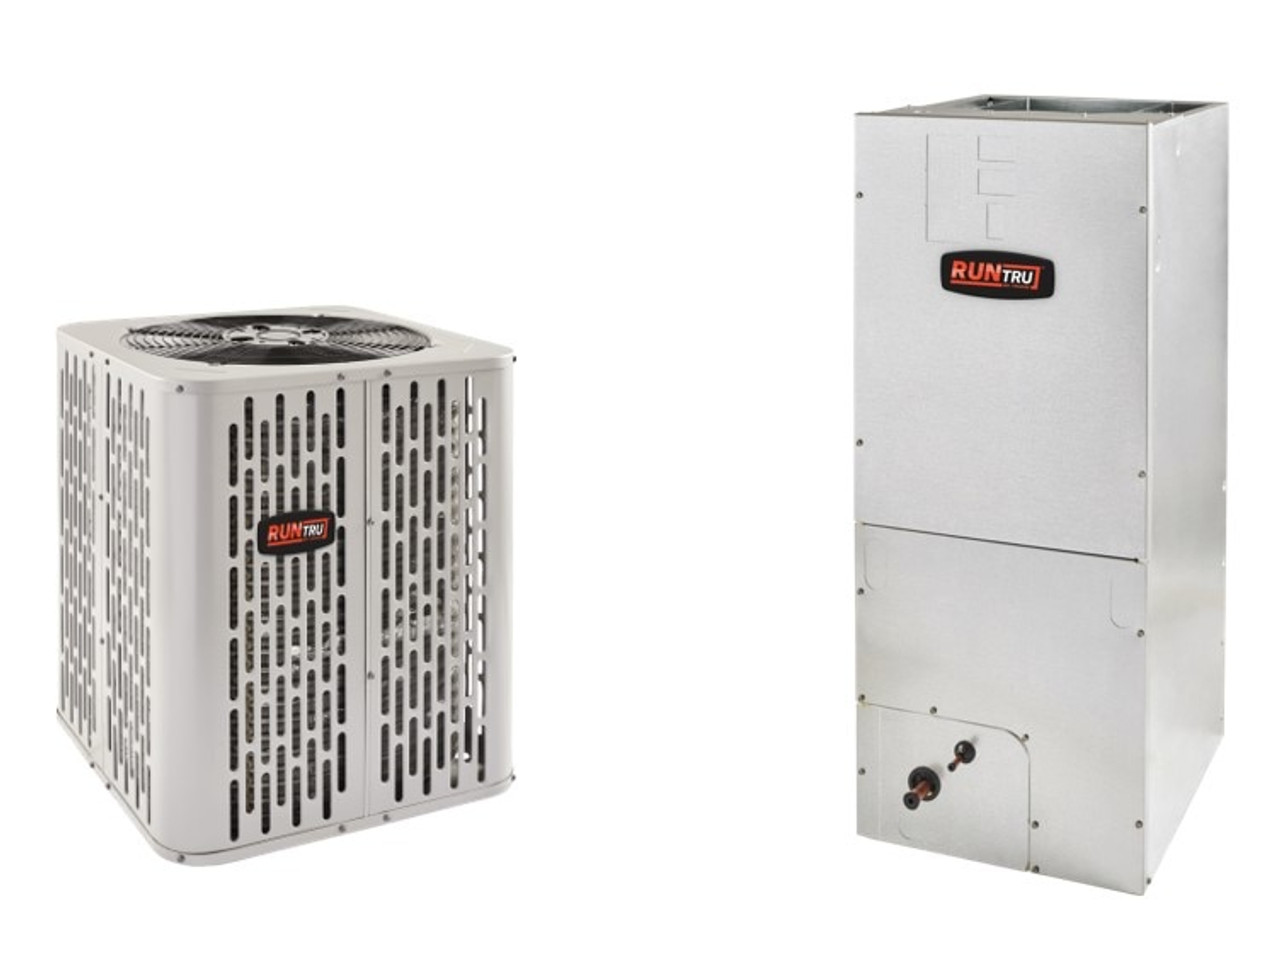 New Ac Depot Sells High Value Diy Central Air Conditioning Direct Including This Runtru By Trane 4 Ton Heat Pump Condenser Model A4hp4048a1000a Air Handler Model A4ah4e48a1c30a